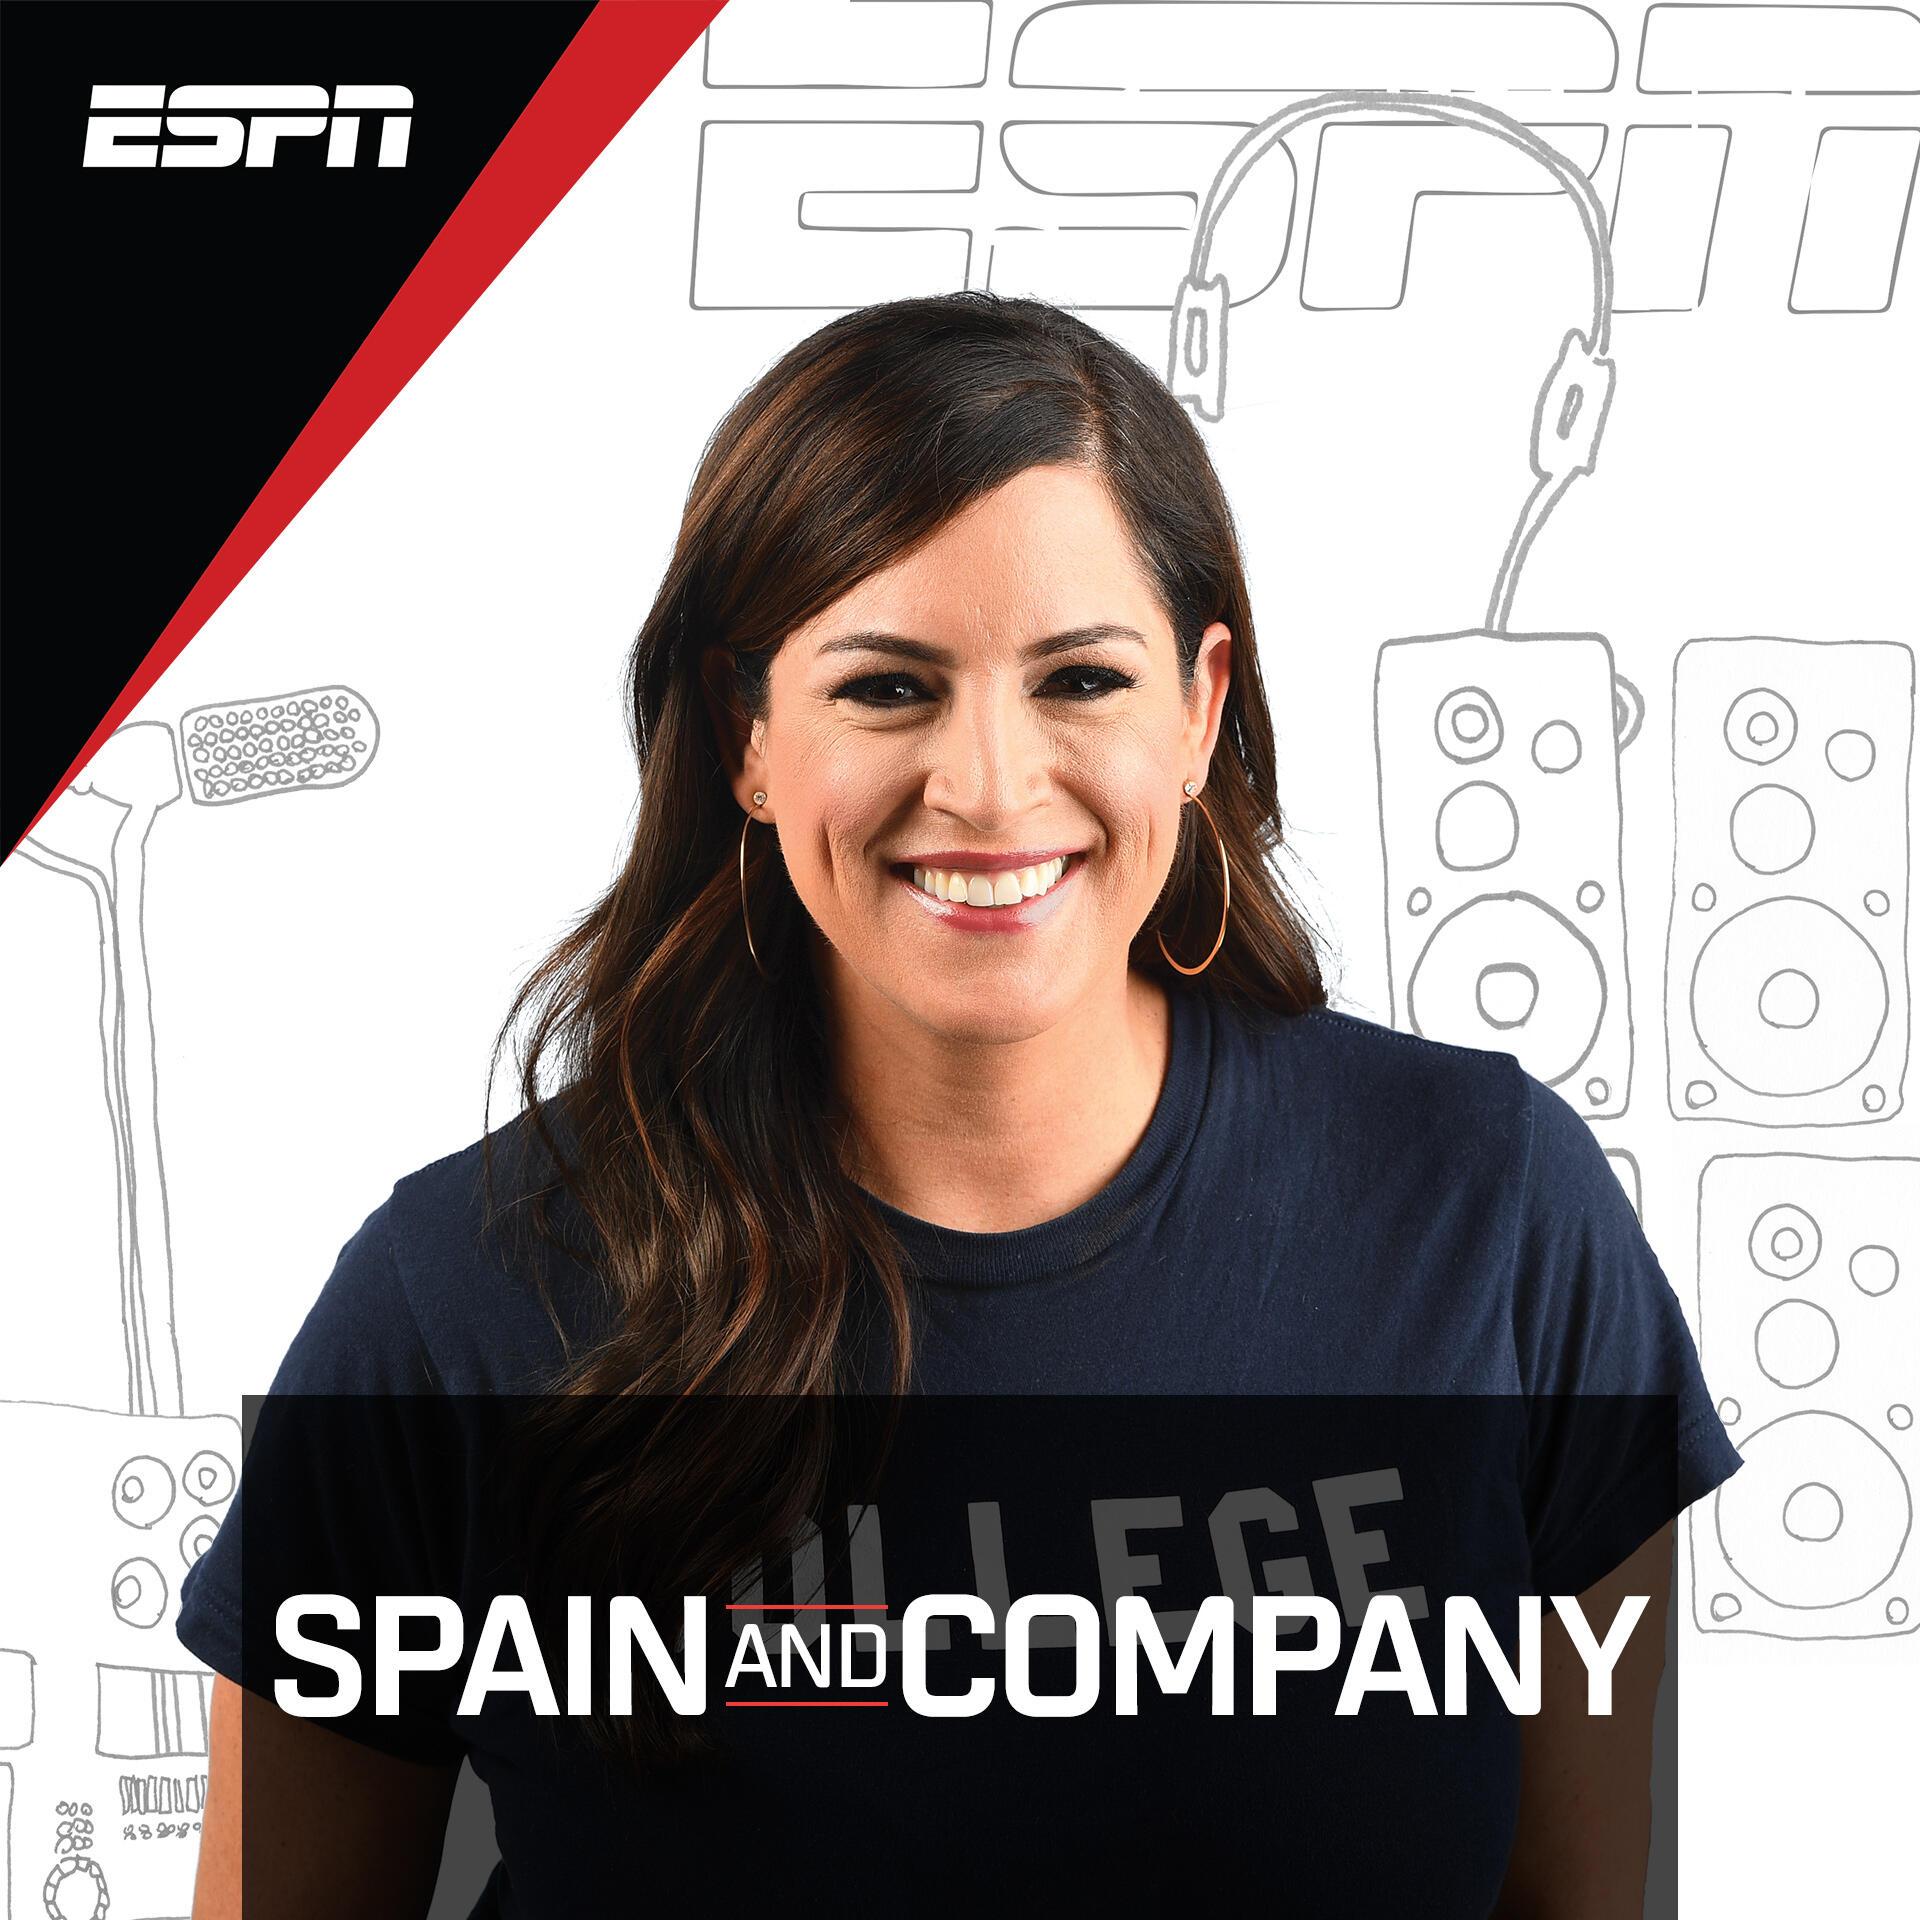 Spain and Company